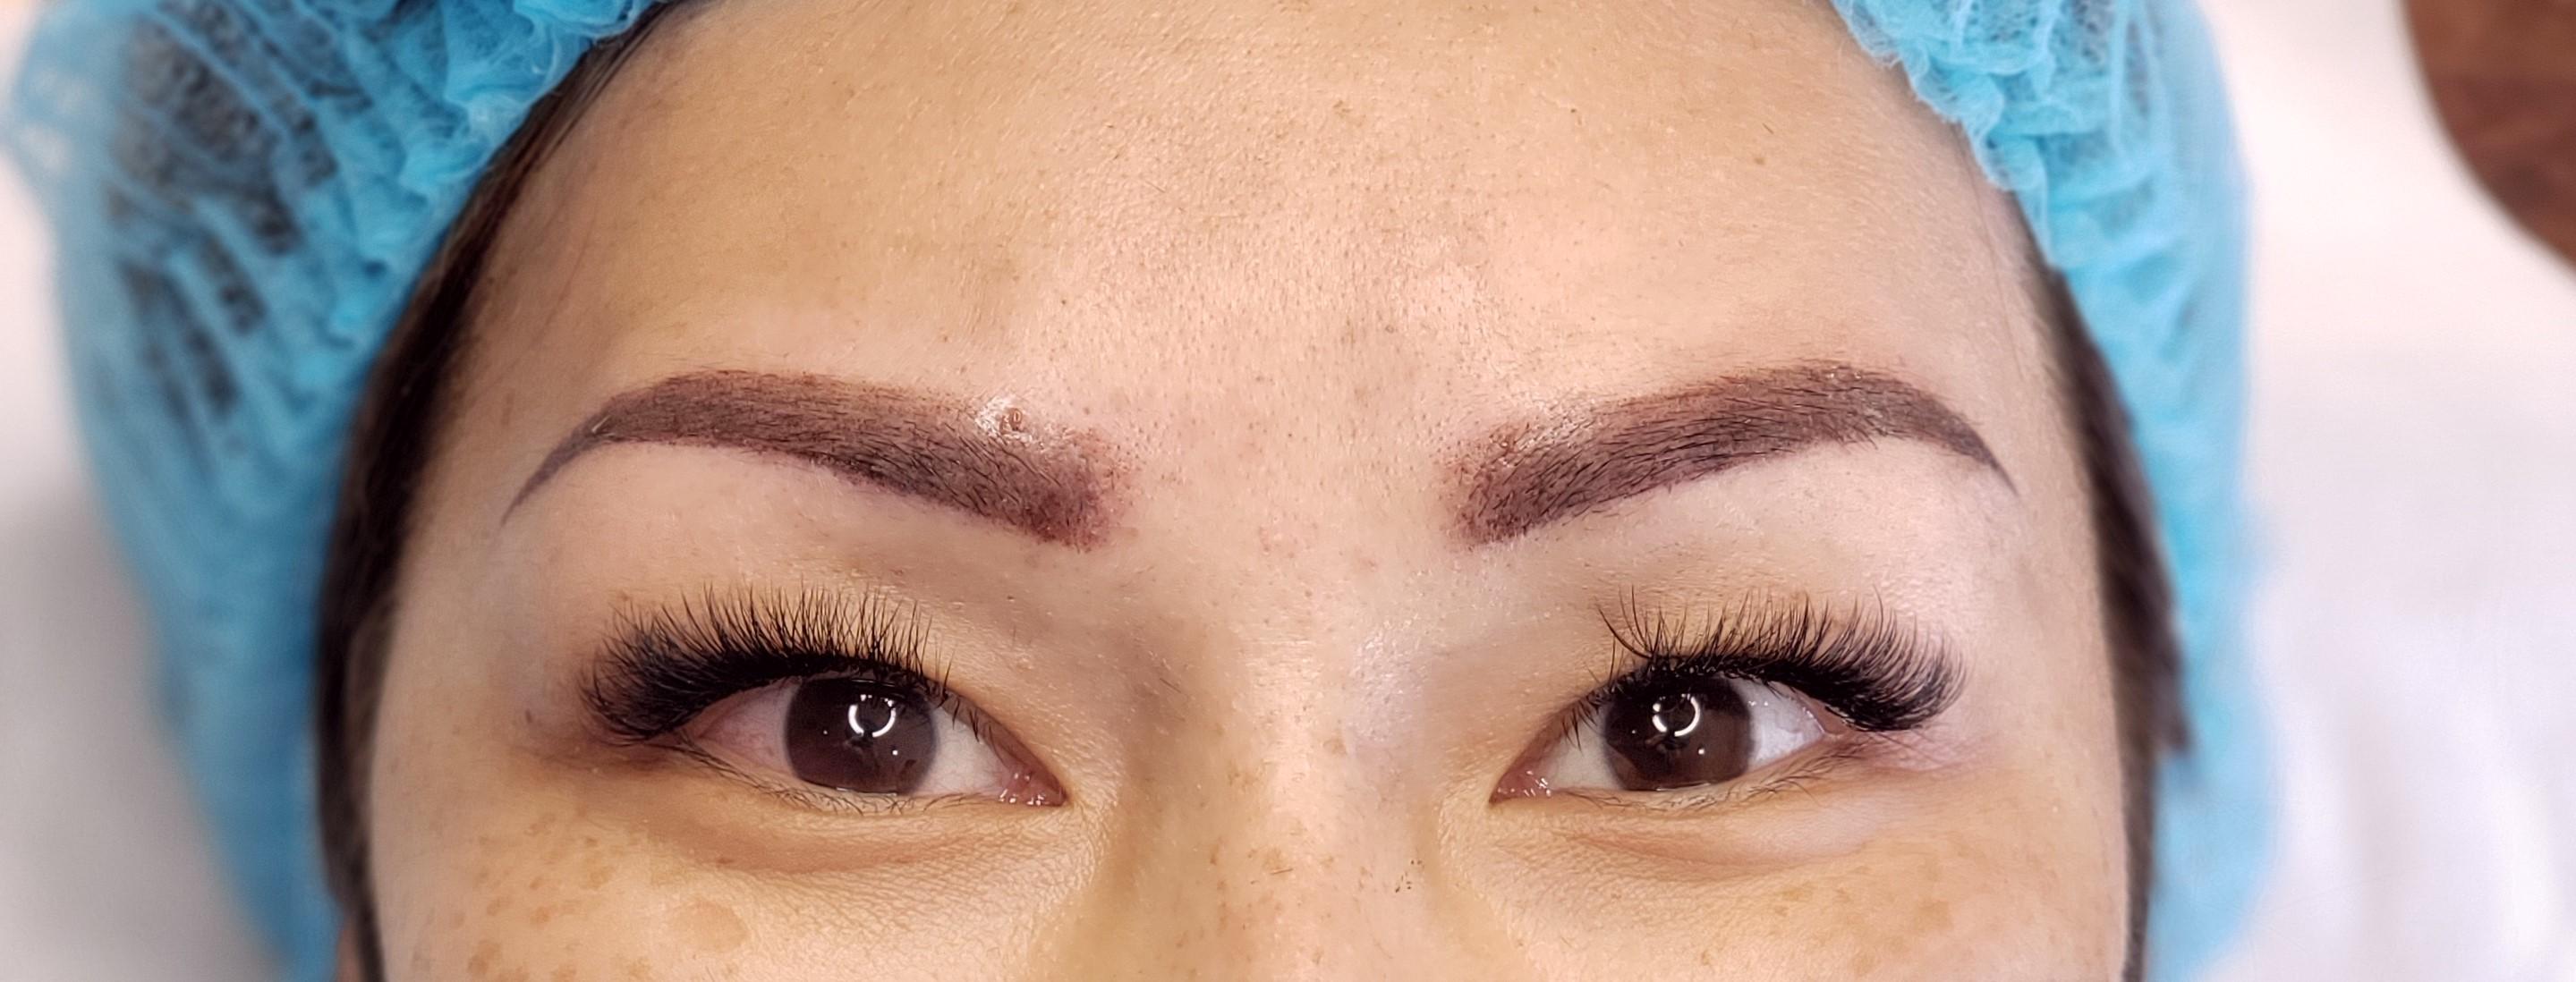 pixelated brow 2